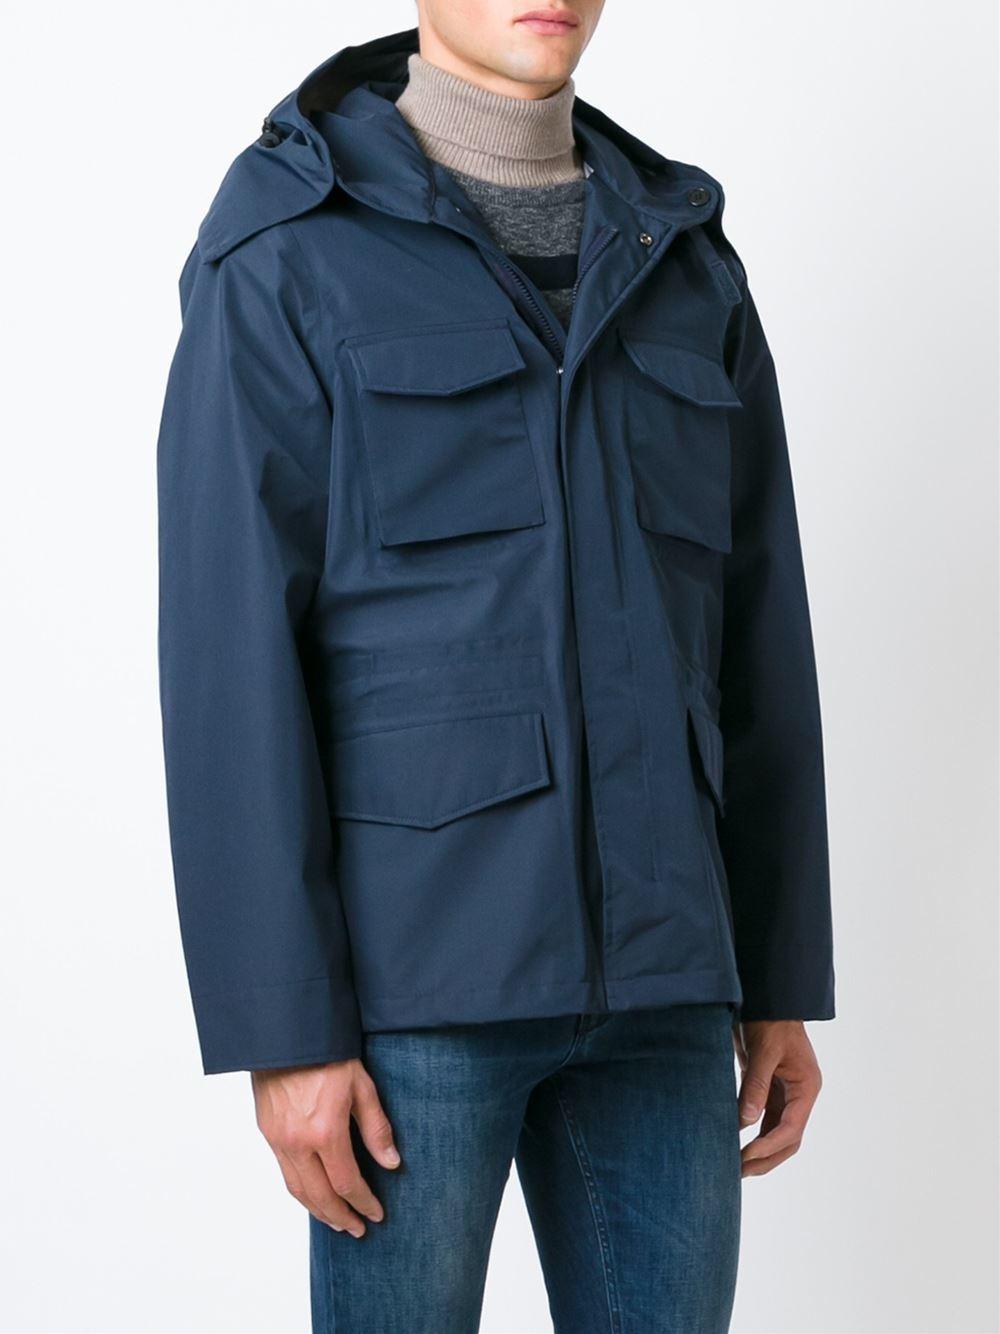 Aspesi Classic Parka Jacket in Blue for Men | Lyst